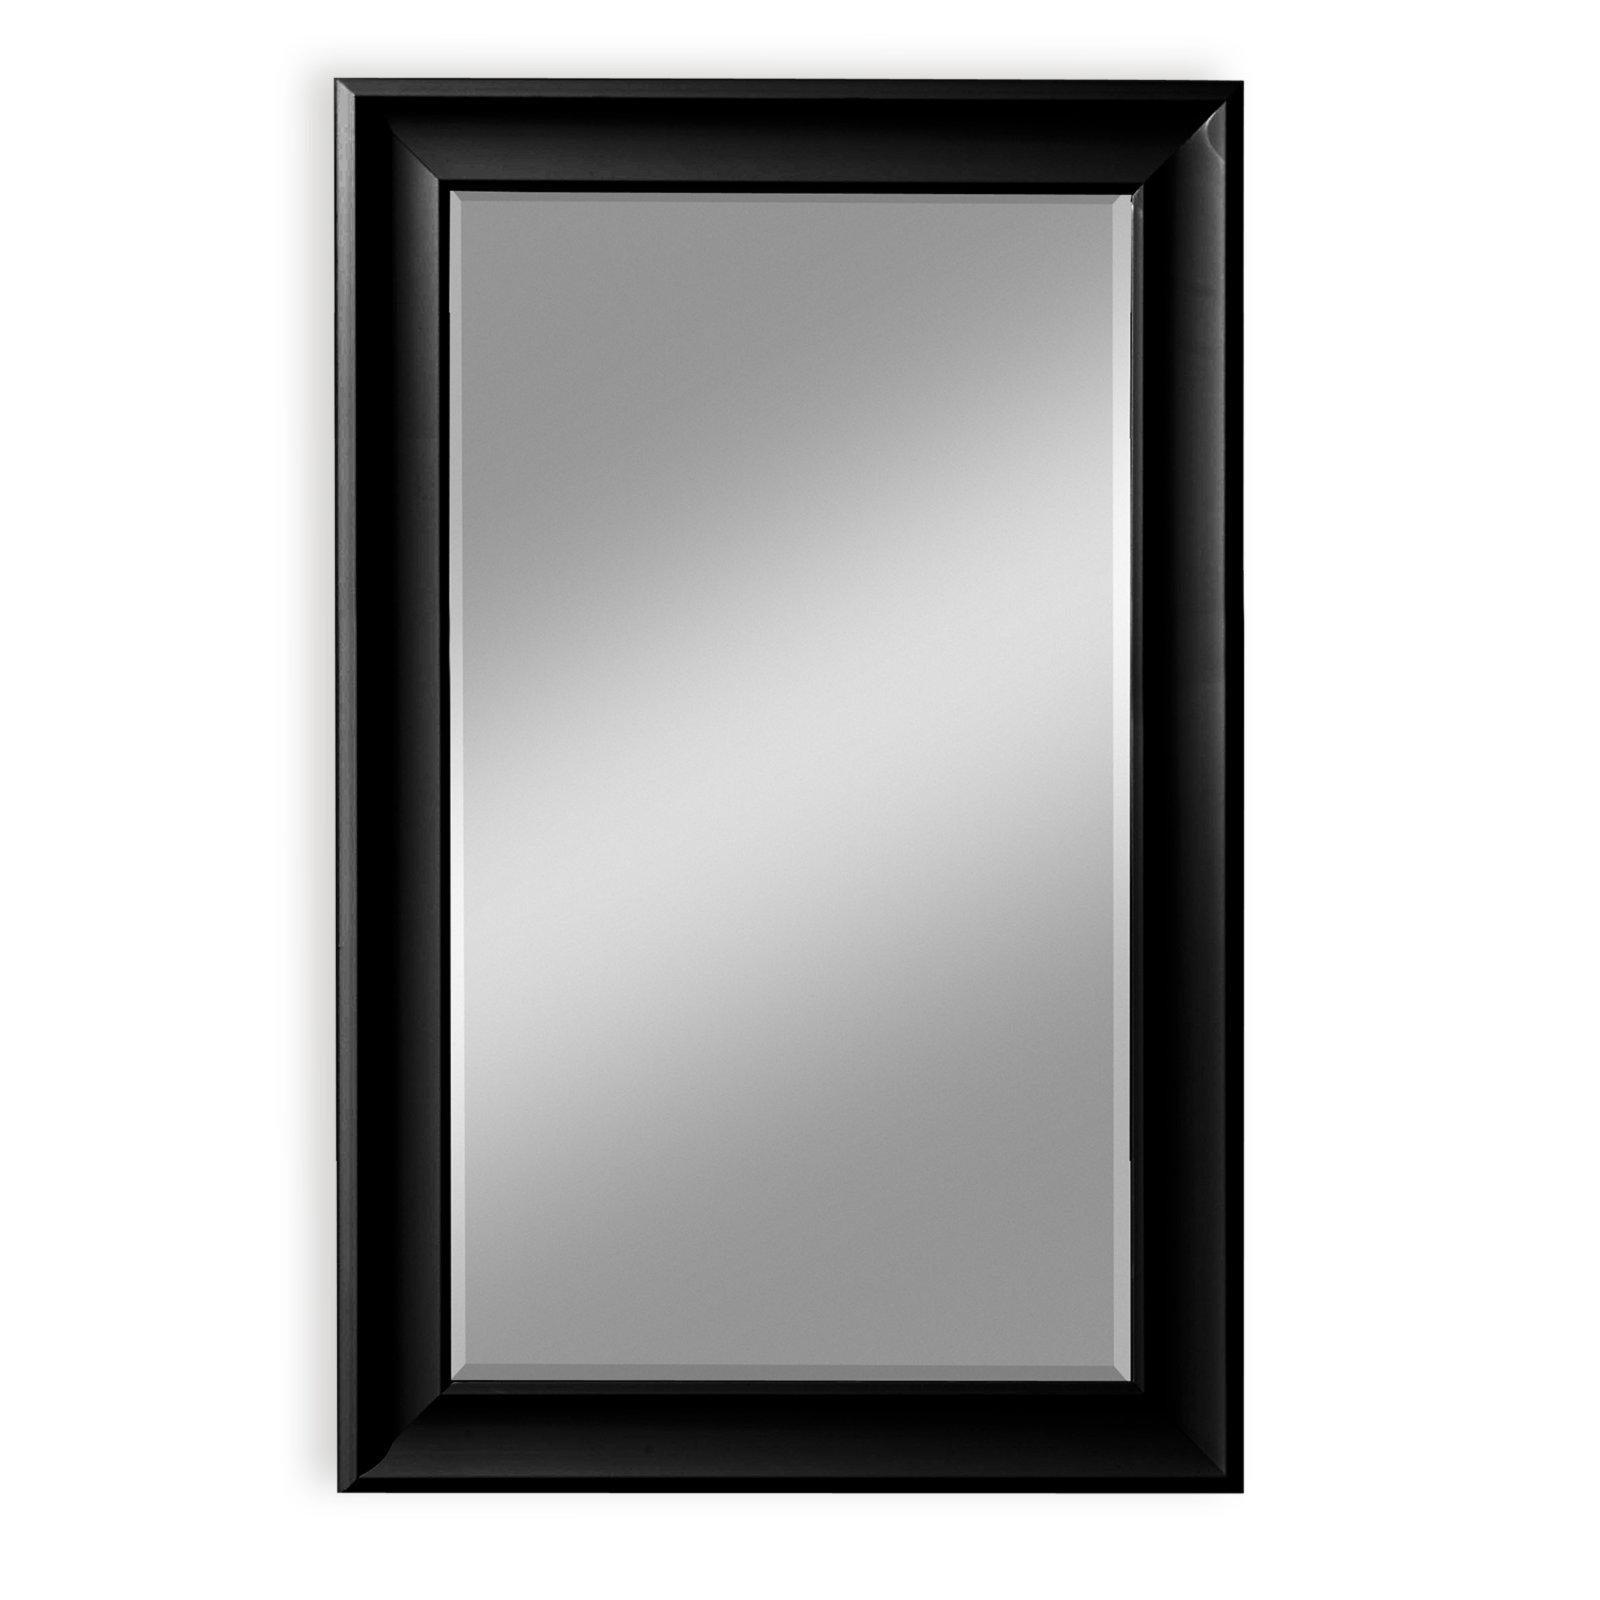 wandspiegel nizza schwarz gl nzend 78x110 cm. Black Bedroom Furniture Sets. Home Design Ideas